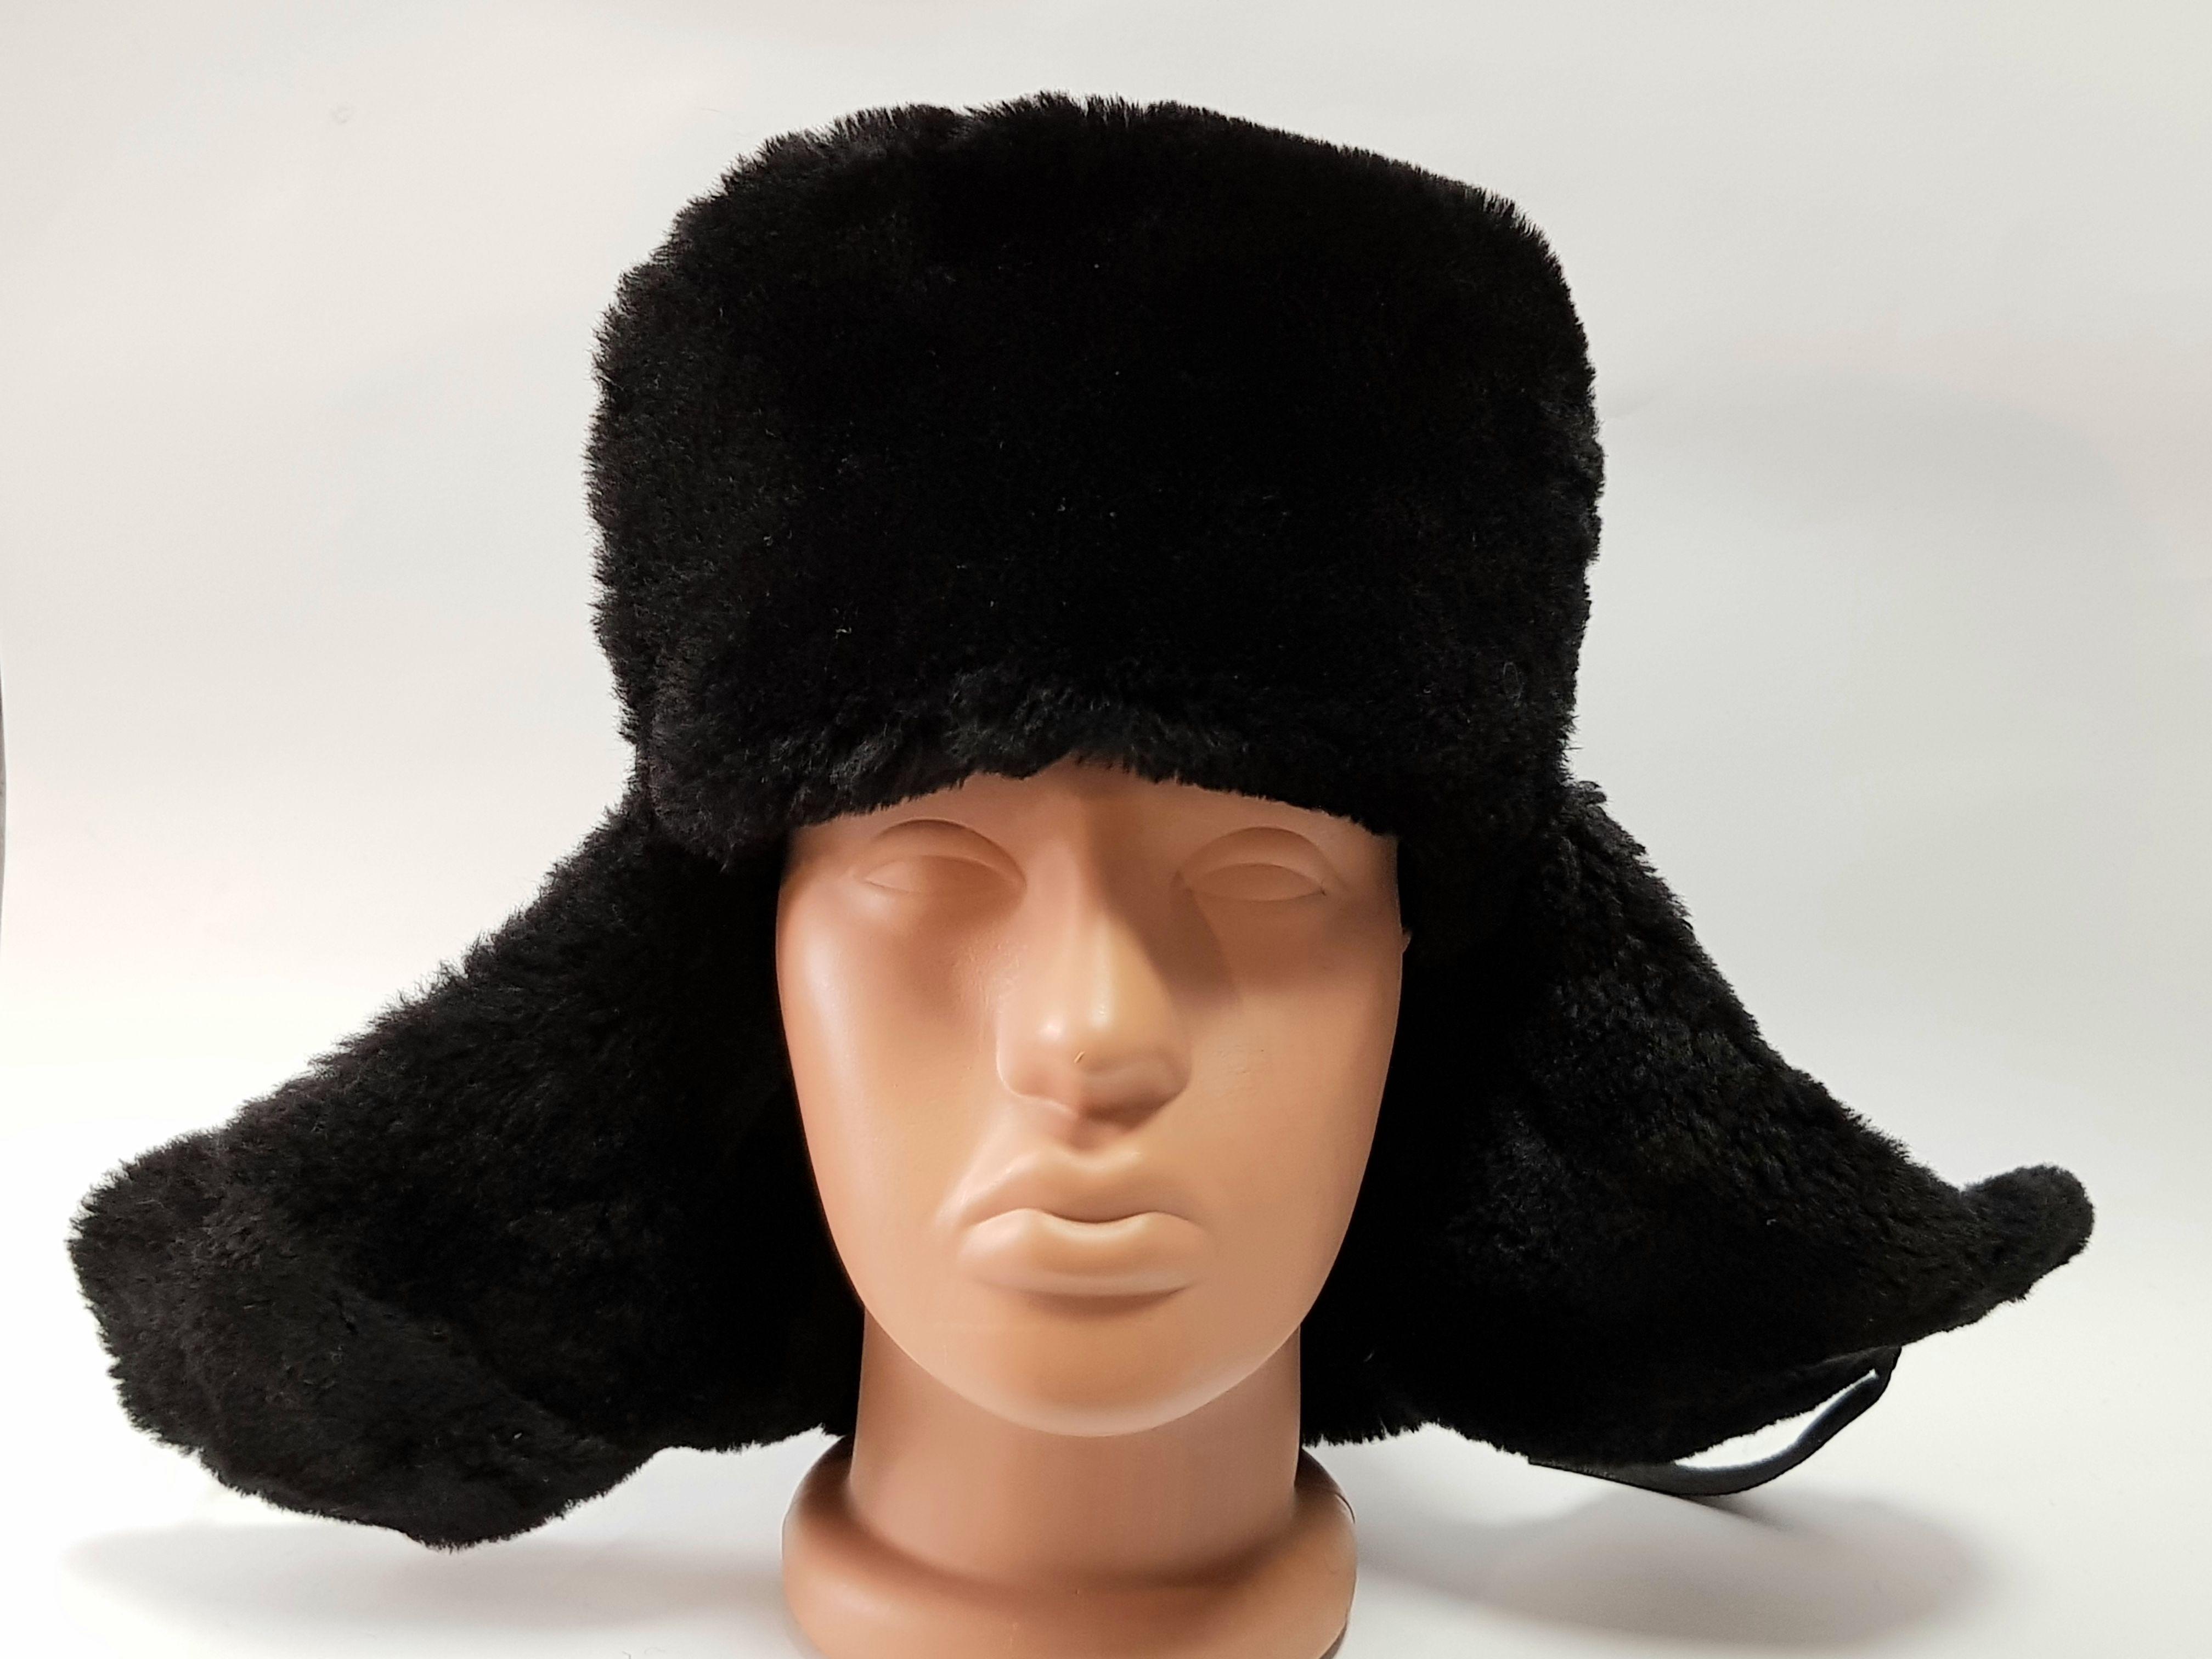 Russian Hat Ear Flap Soviet Ushanka Real Fur Hat Mouton Winter Etsy Ushanka Russian Hat Hats